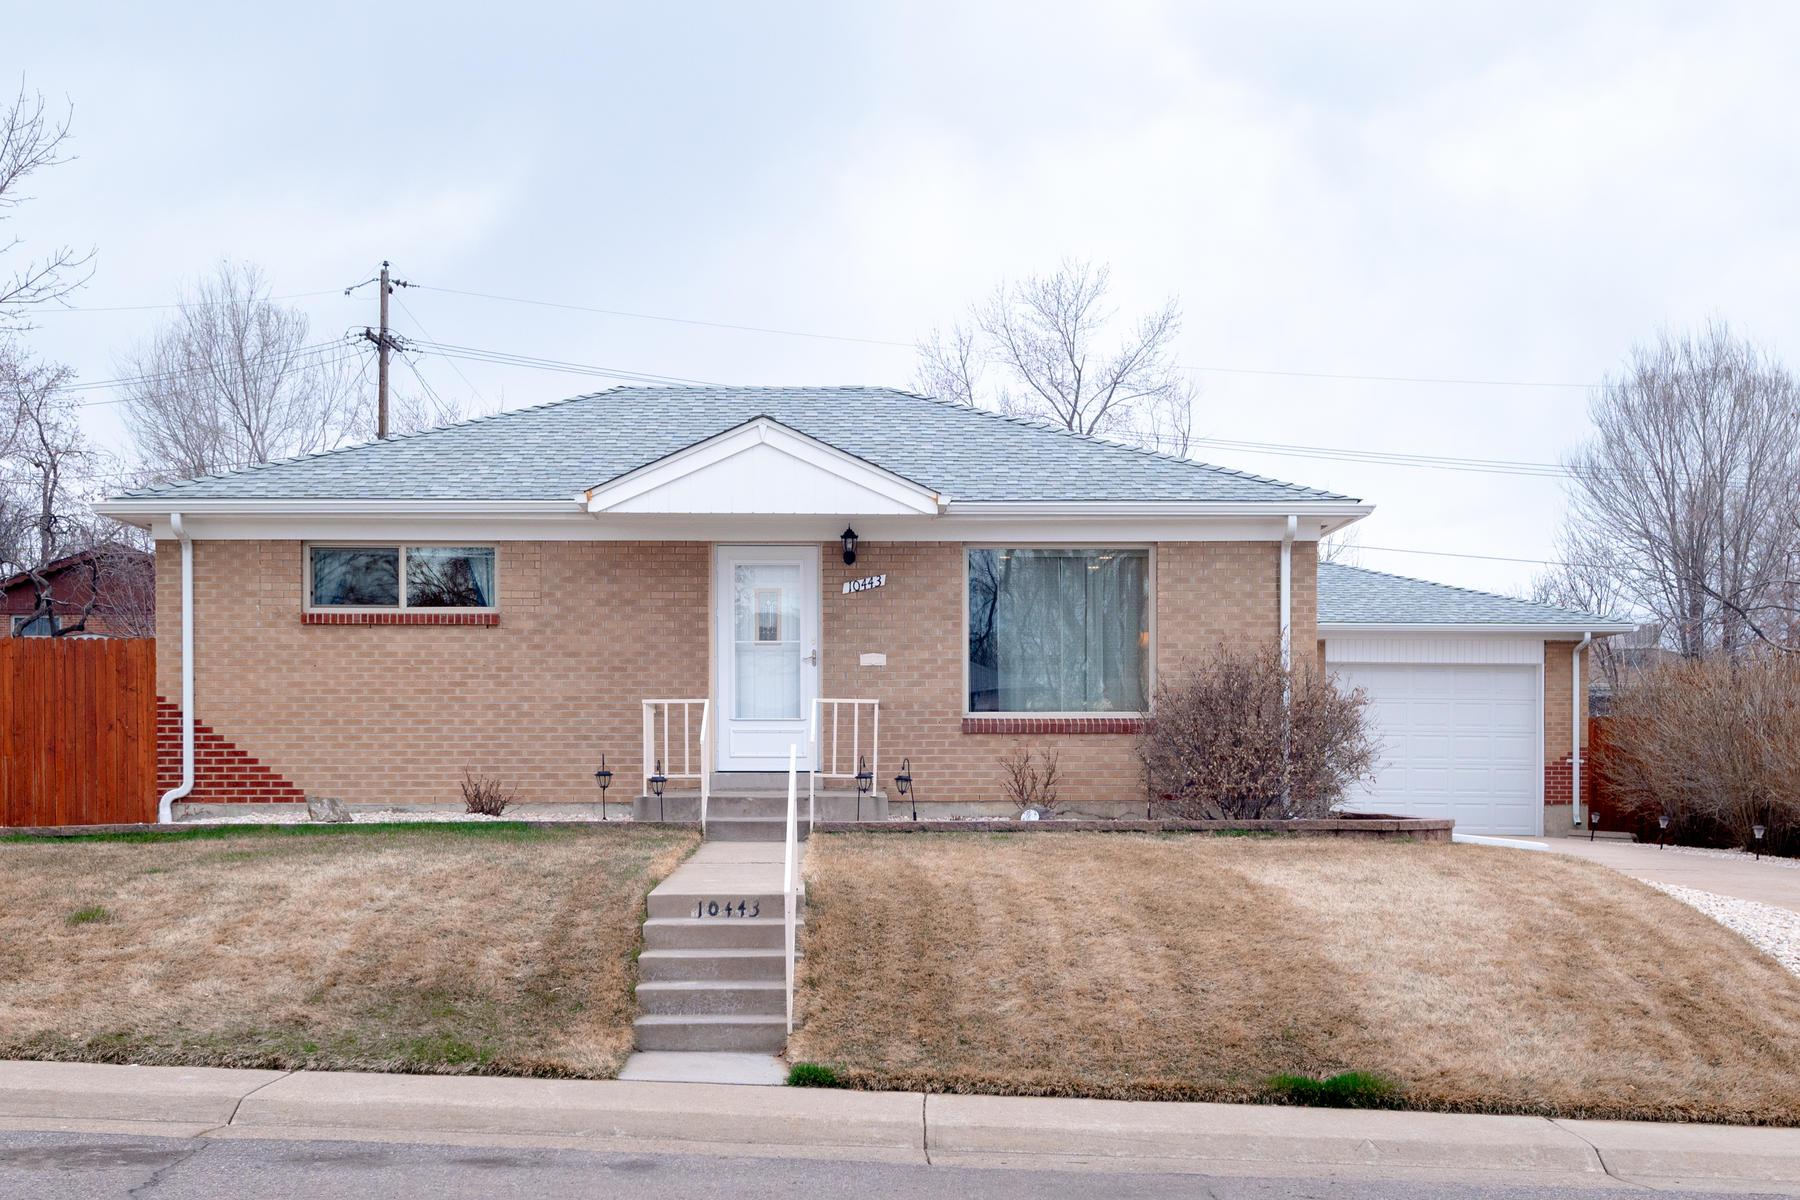 Single Family Homes のために 売買 アット Pride of Ownership Shines Through This Solid Brick Mid-Century Ranch 10443 Washington Way Northglenn, コロラド 80233 アメリカ